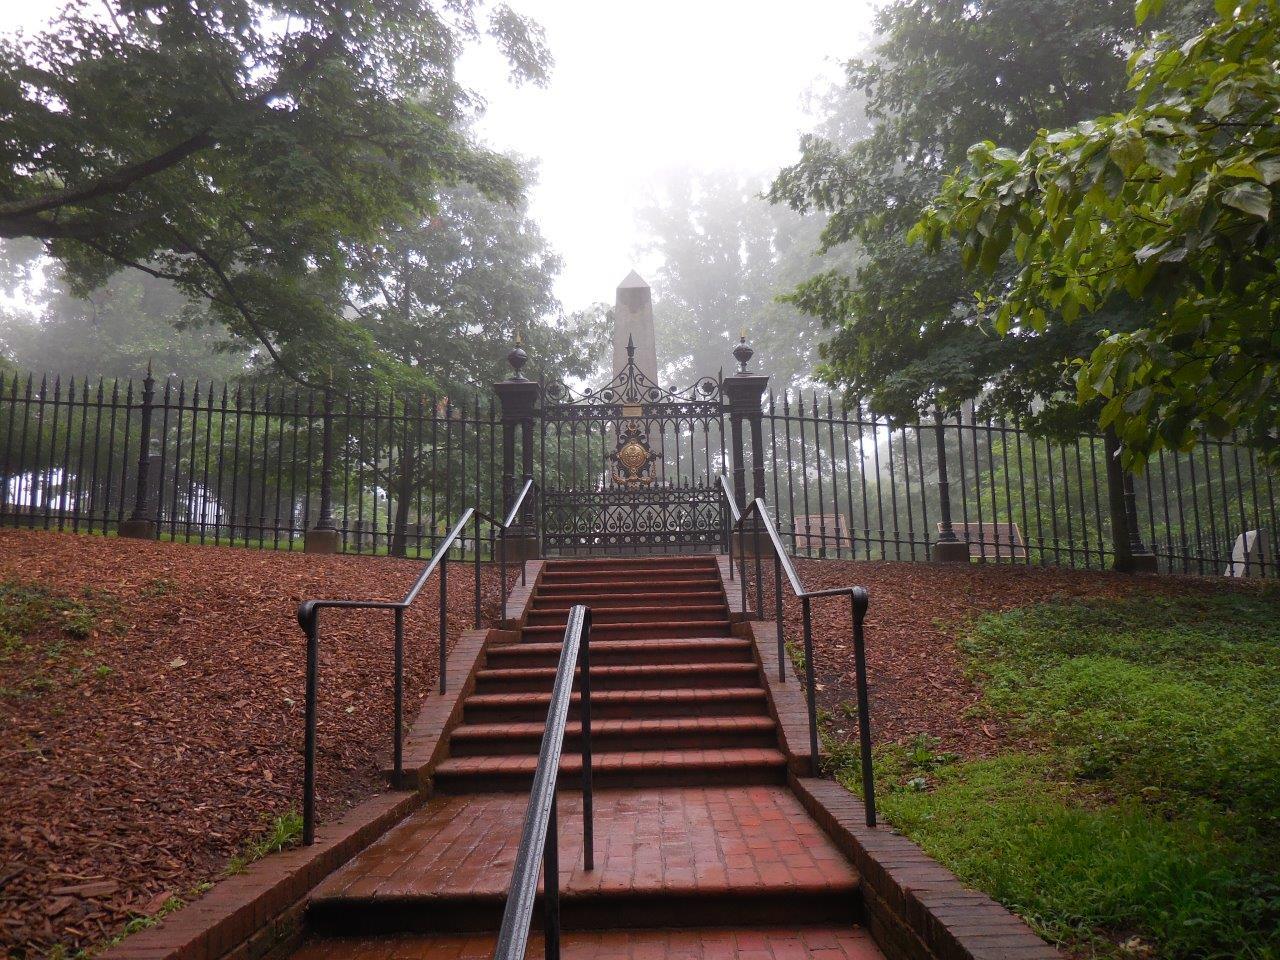 Monticello Graveyard - Jefferson Family Cemetery at Monticello